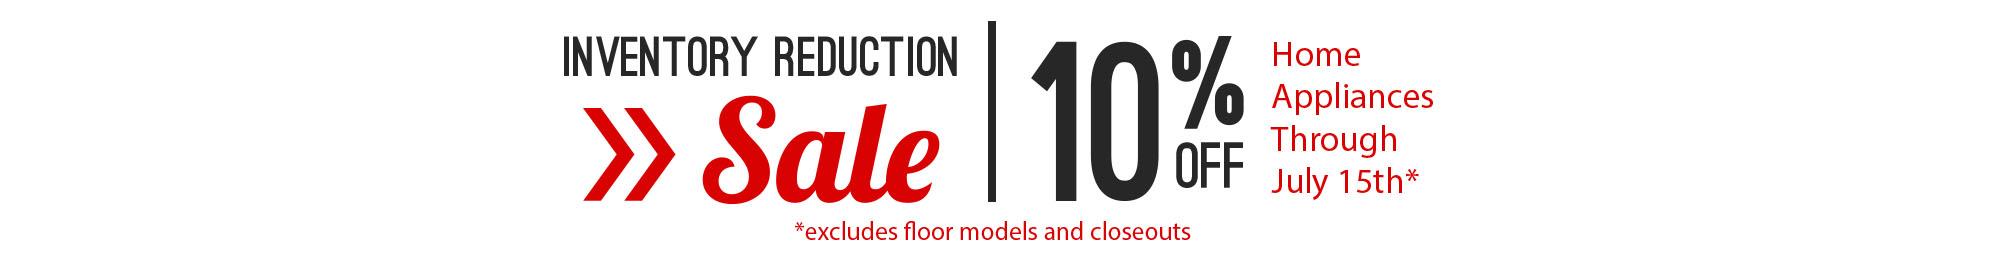 10% sale banner